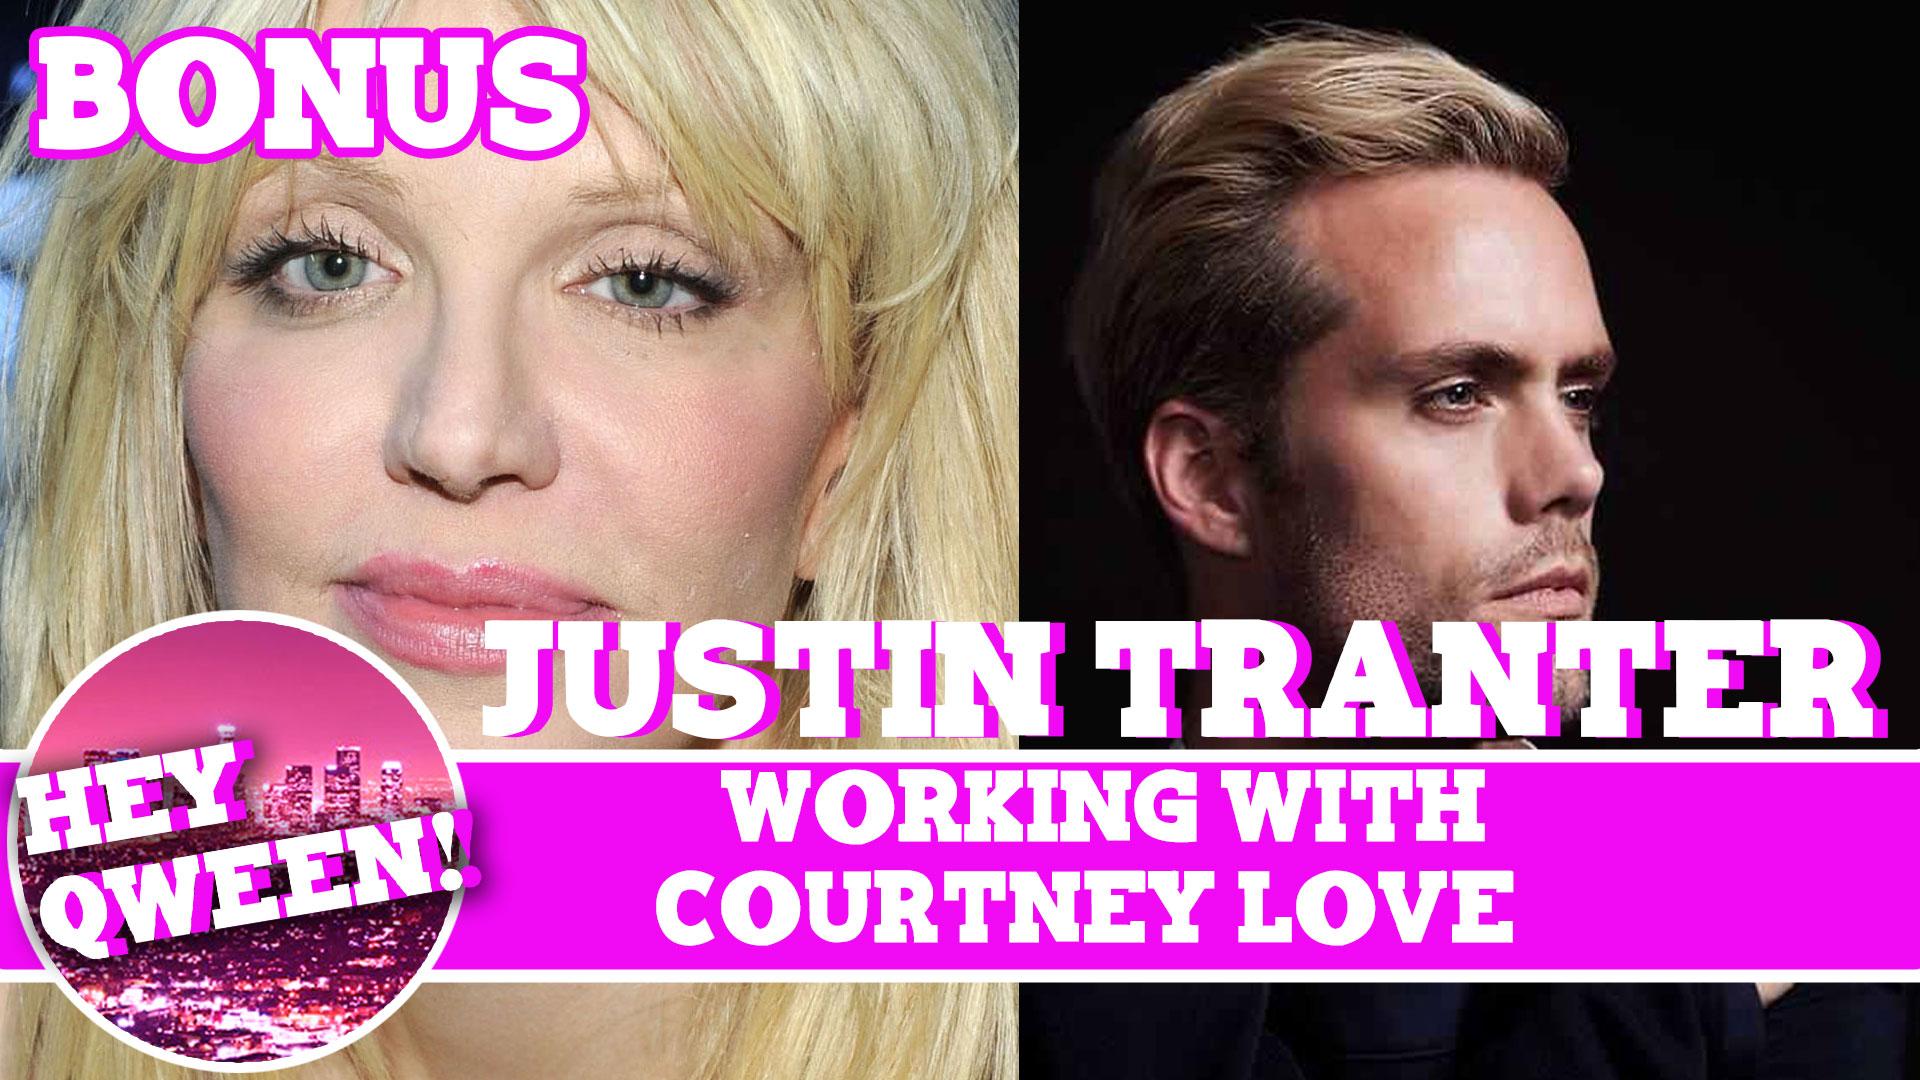 Hey Qween! BONUS: Justin Tranter Writing With Courtney Love